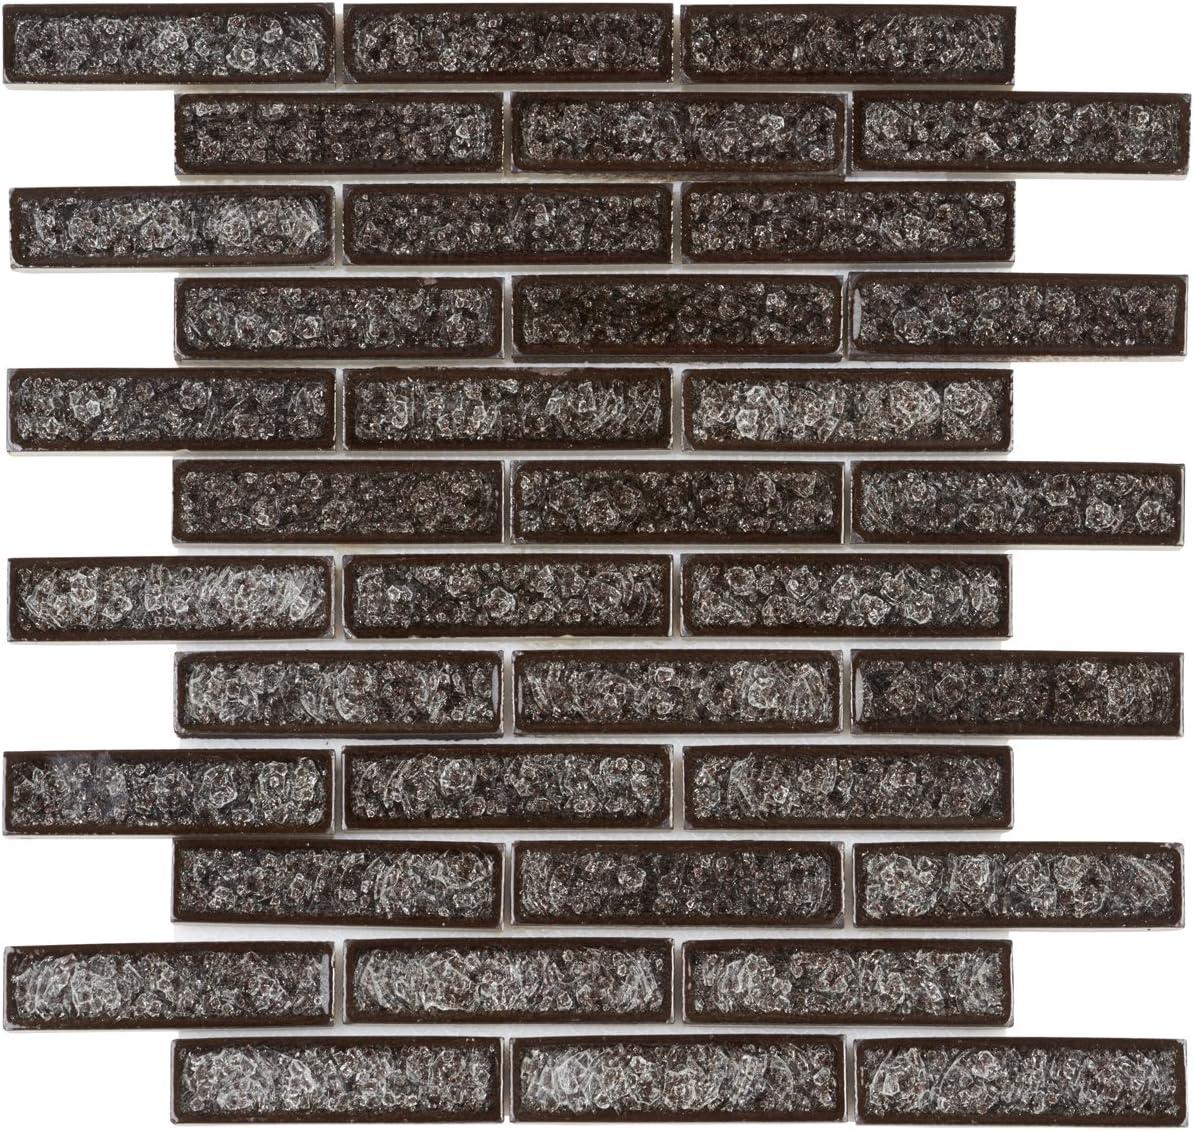 Modket TDH178MO-S Sample Gray Crackle Glass Mosaic Tile Brick Joint Pattern Backsplash